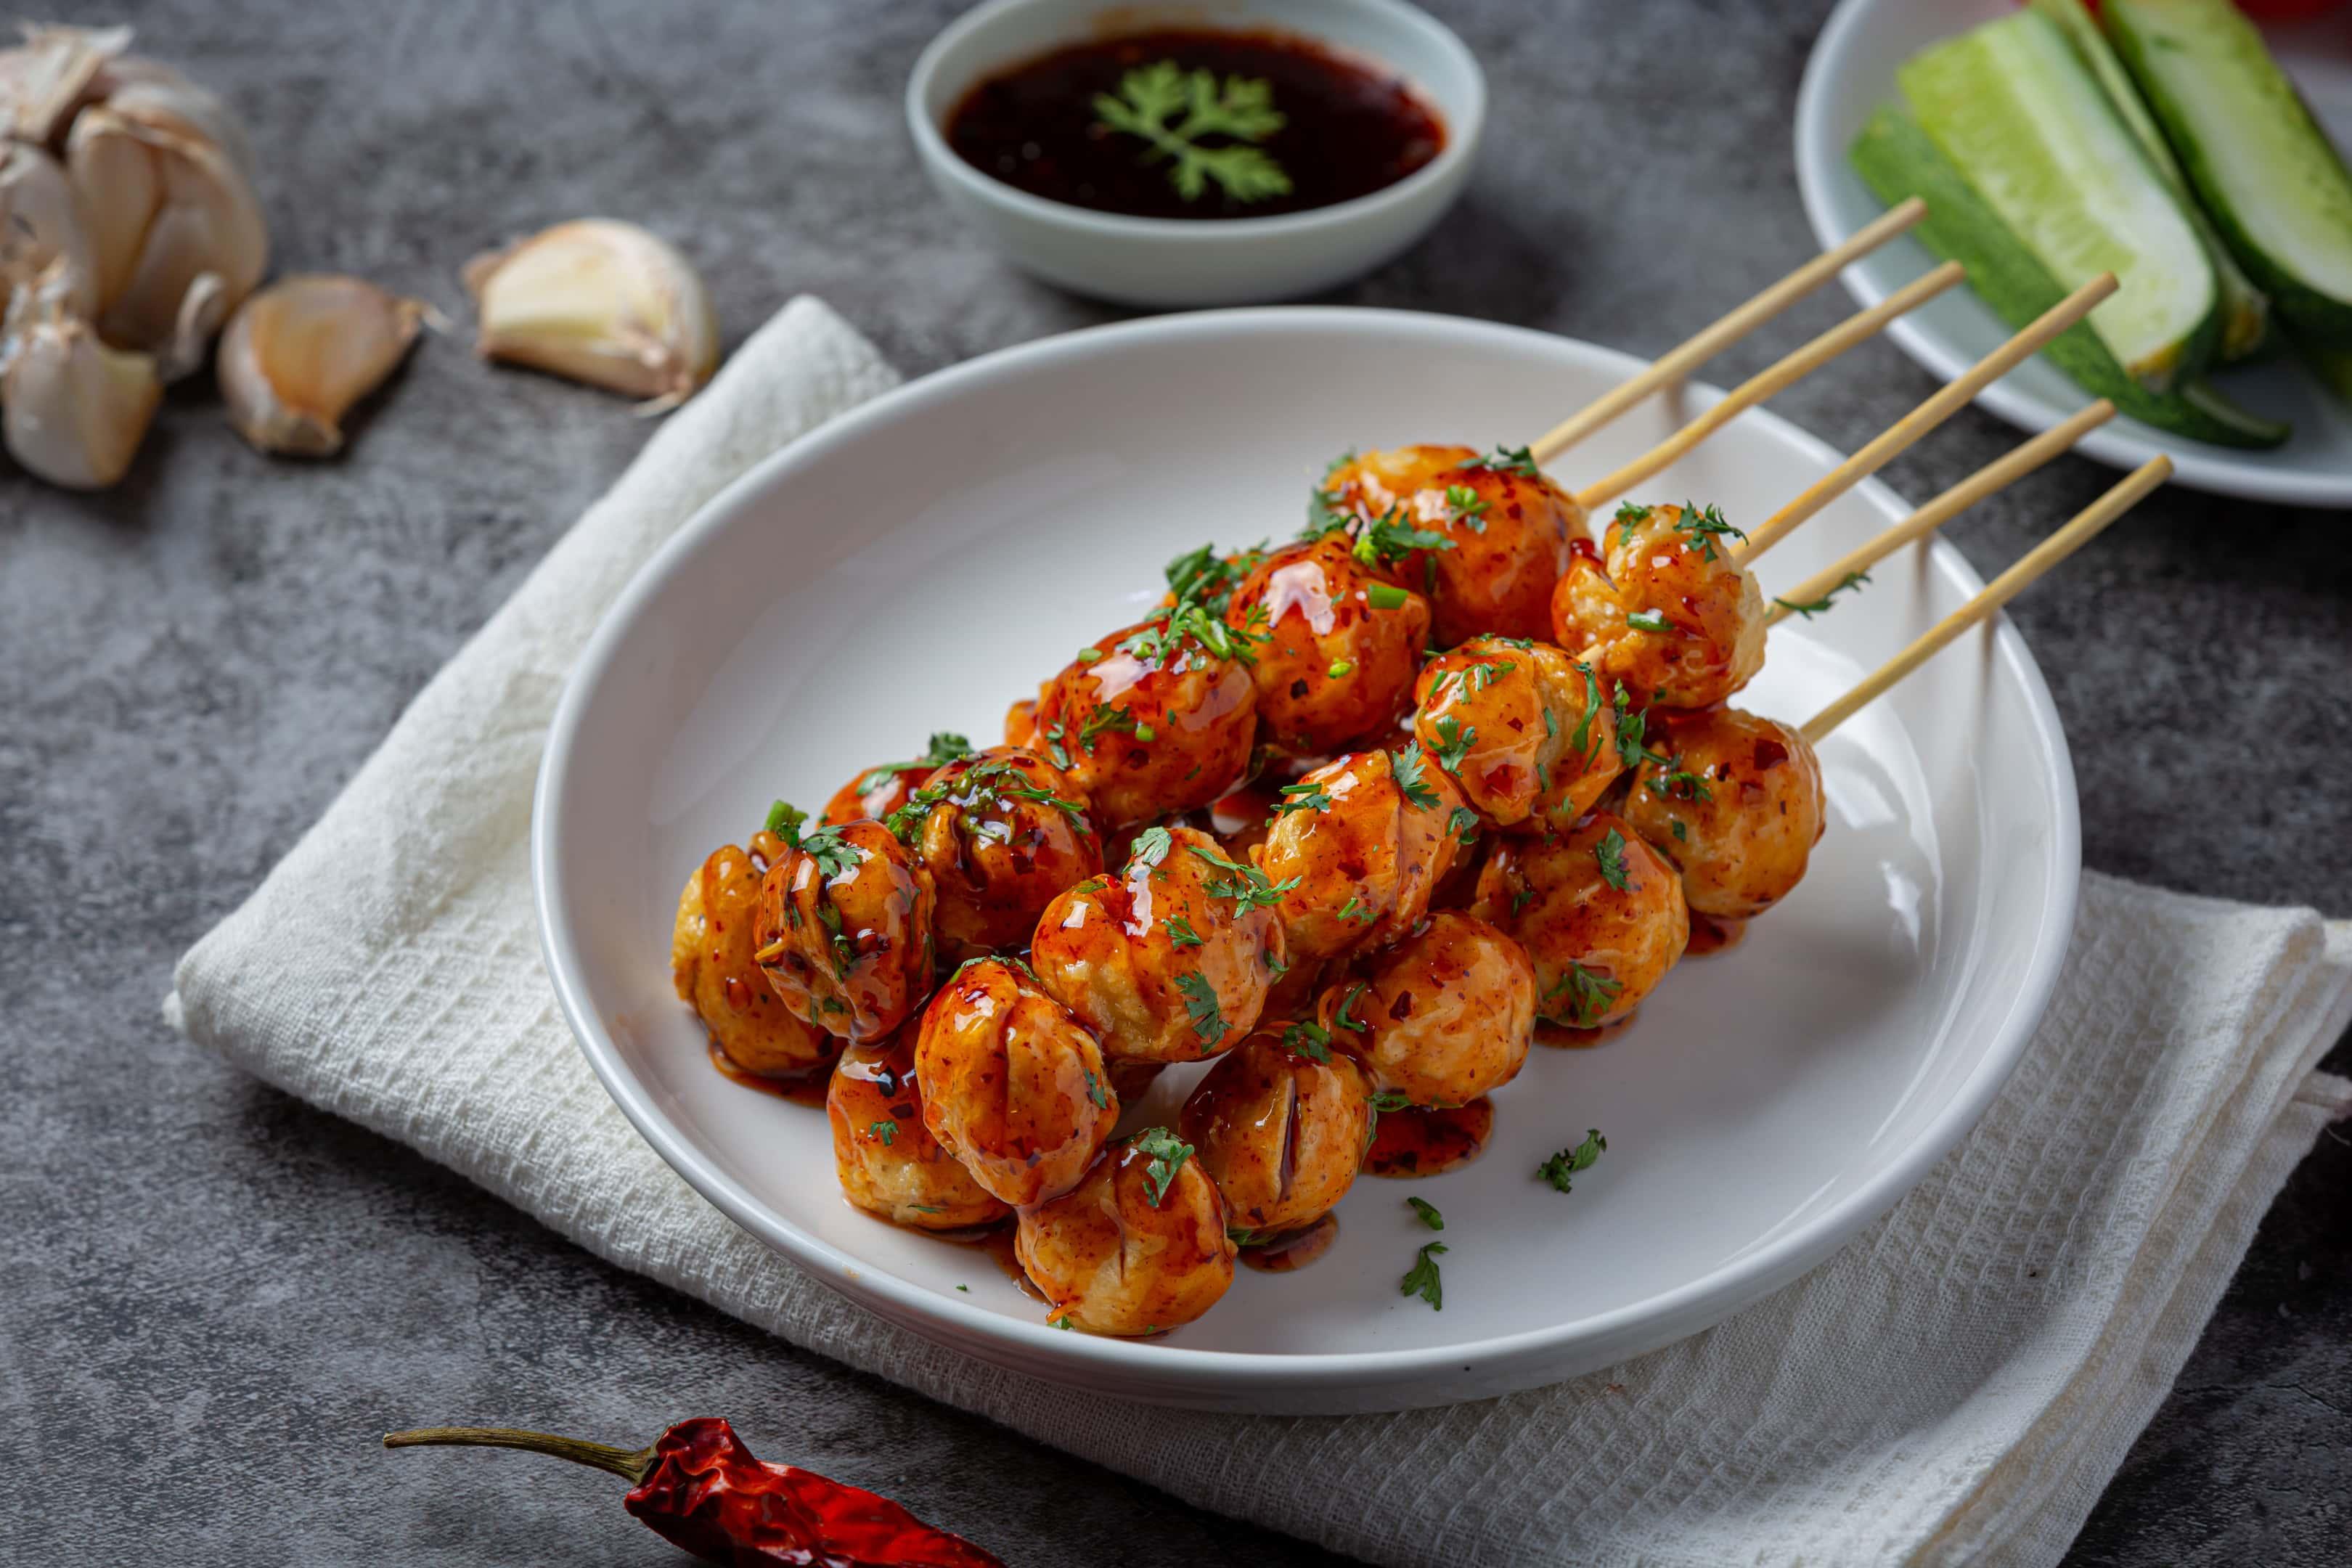 Pork meatballs with sweet chilli sauce